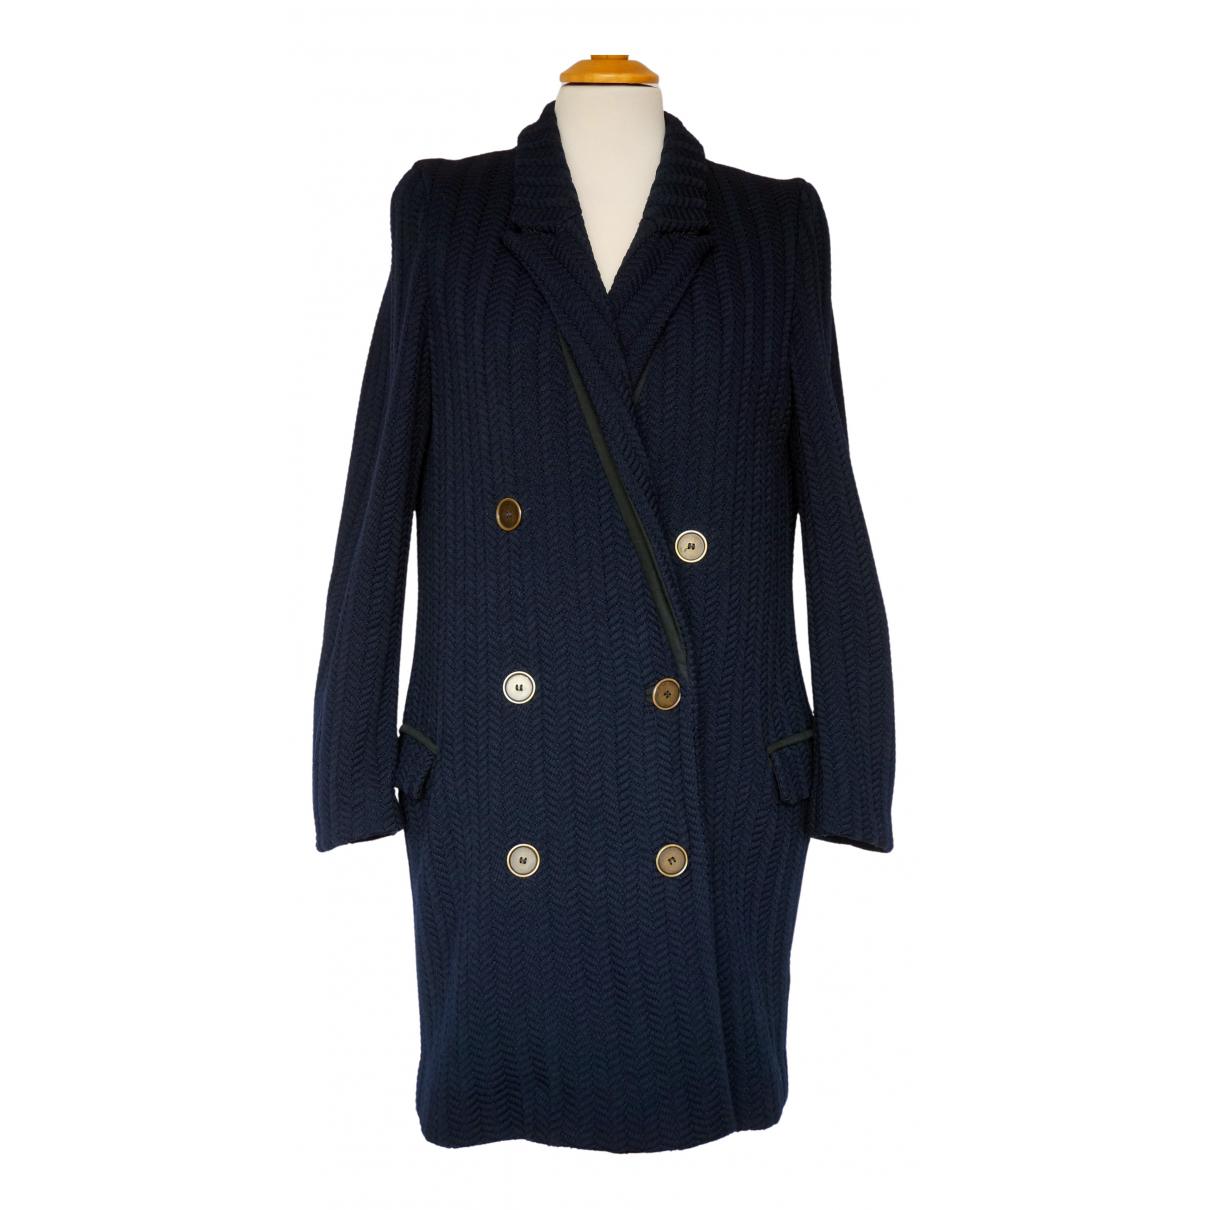 Isabel Marant N Navy Cotton coat for Women 36 FR